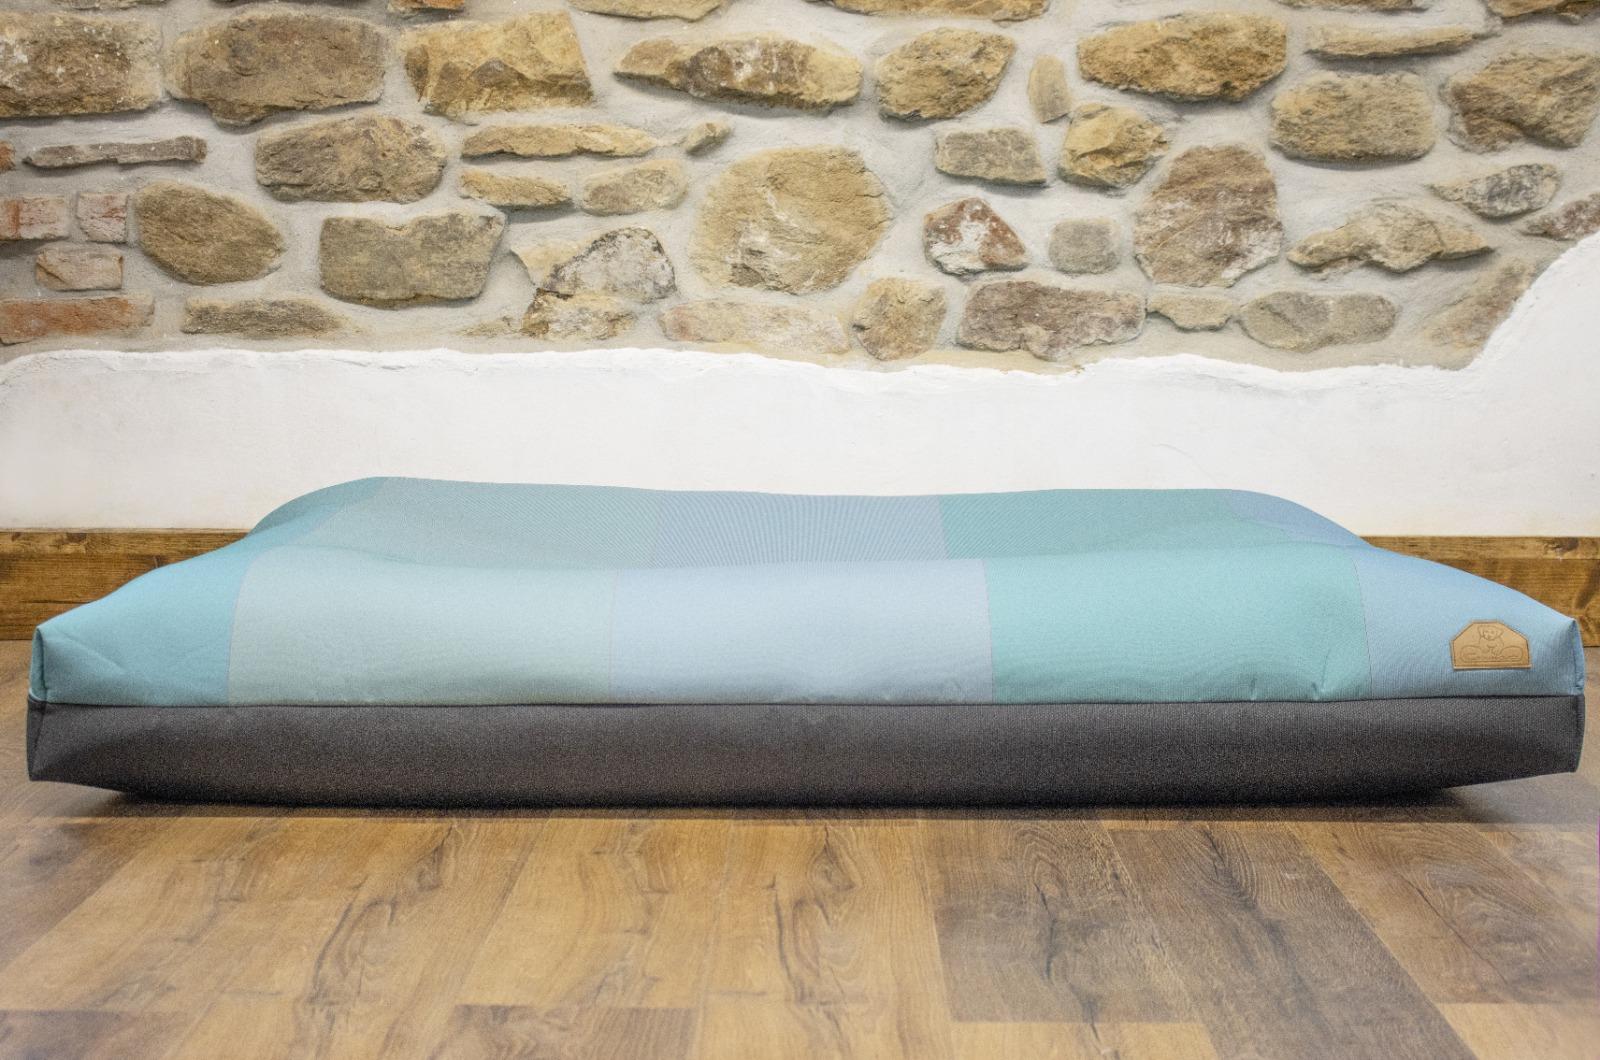 Cerino pelech Ortona - textilní potah kostkovaný 160x120x15cm